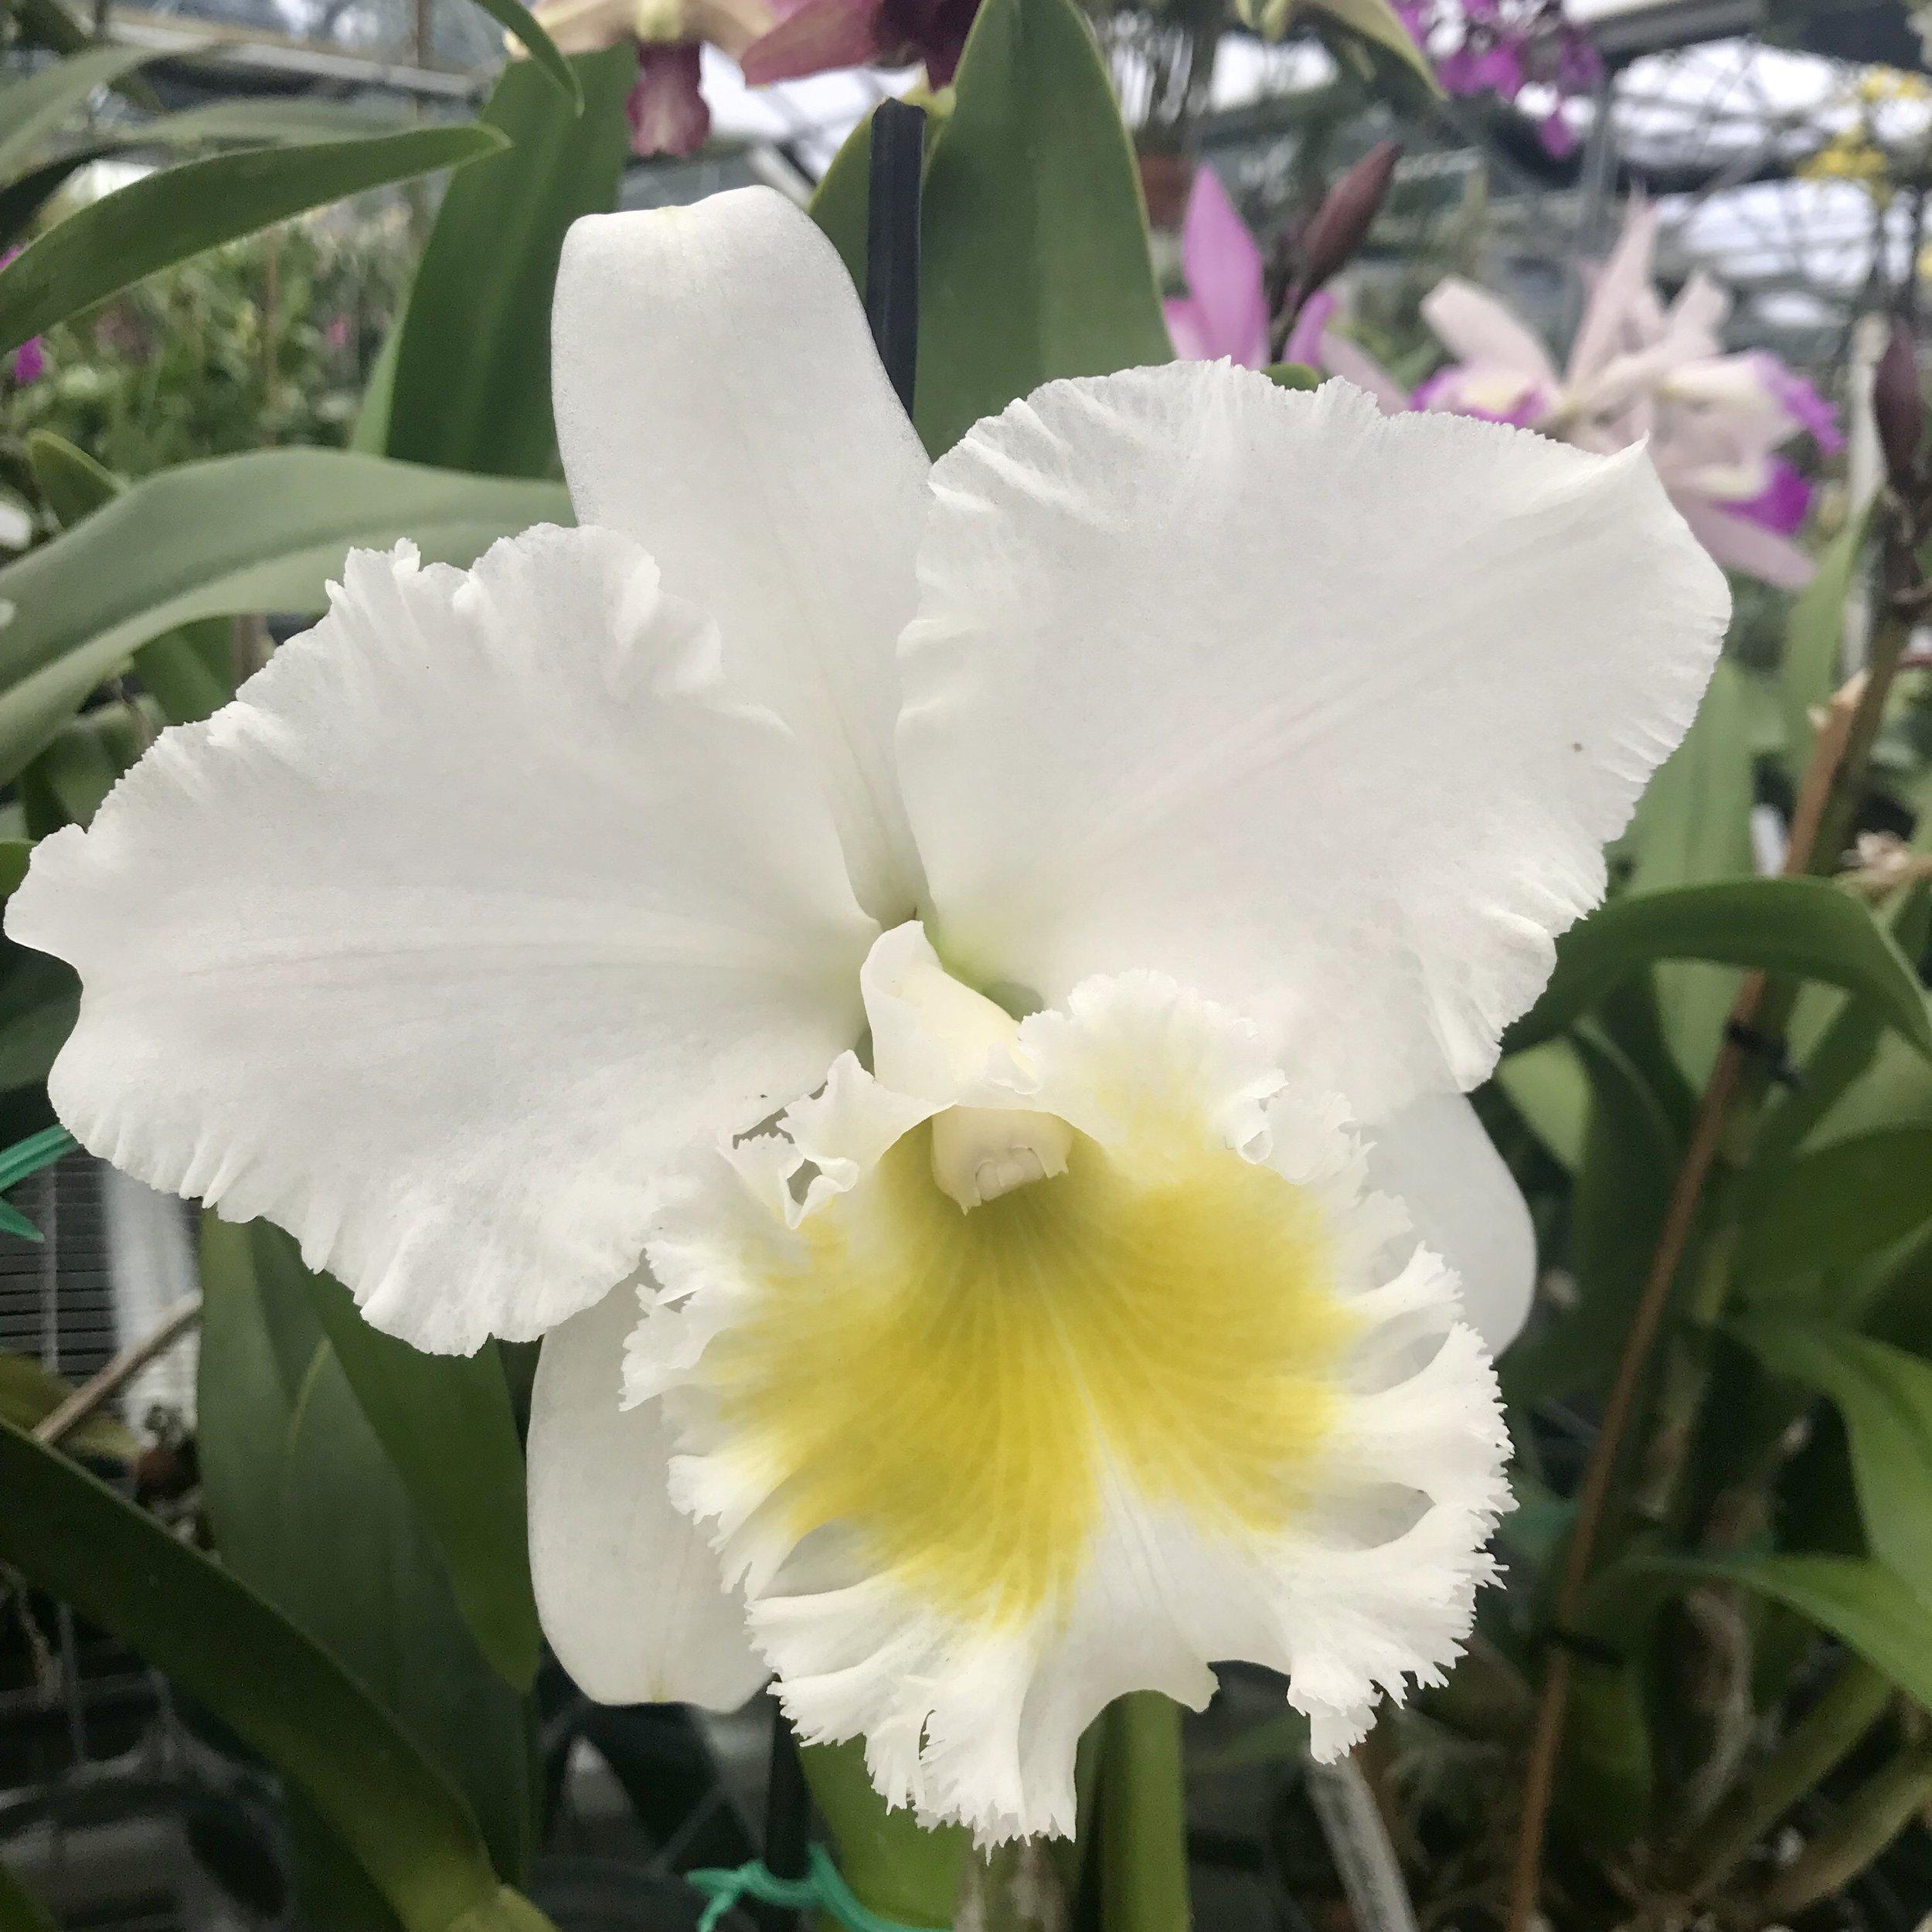 Rlc Blc Burdekin Wonder White Cattleya Palmer Orchids